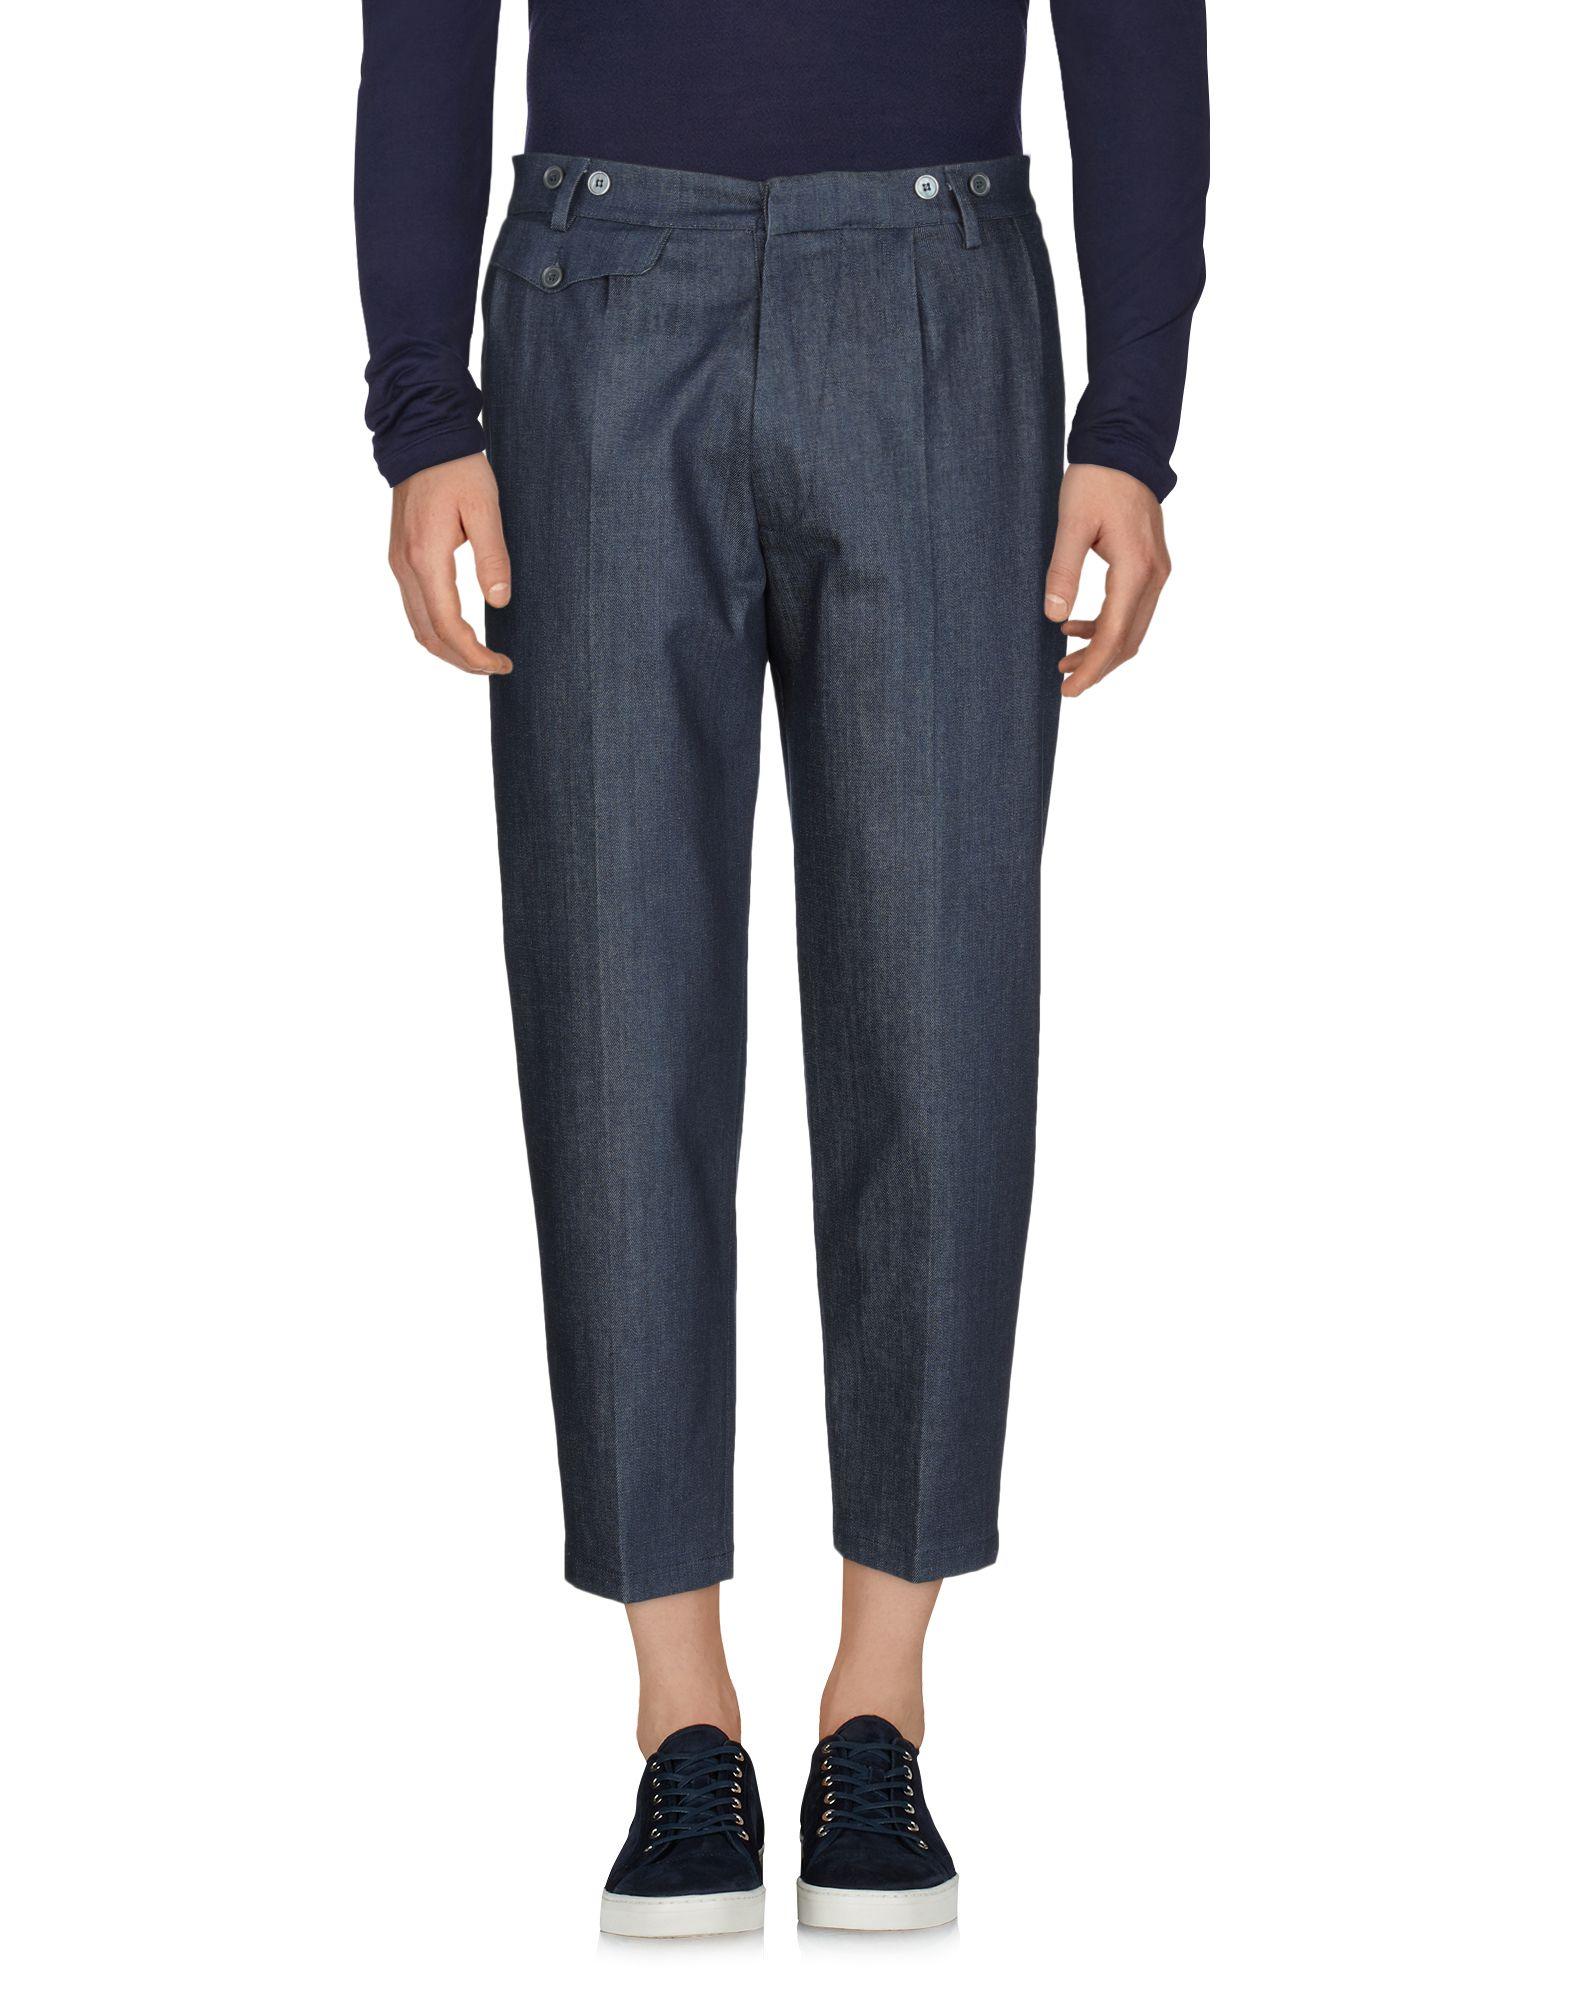 Pantaloni Jeans John Sheep - Uomo - Sheep 42684338XV 56029c